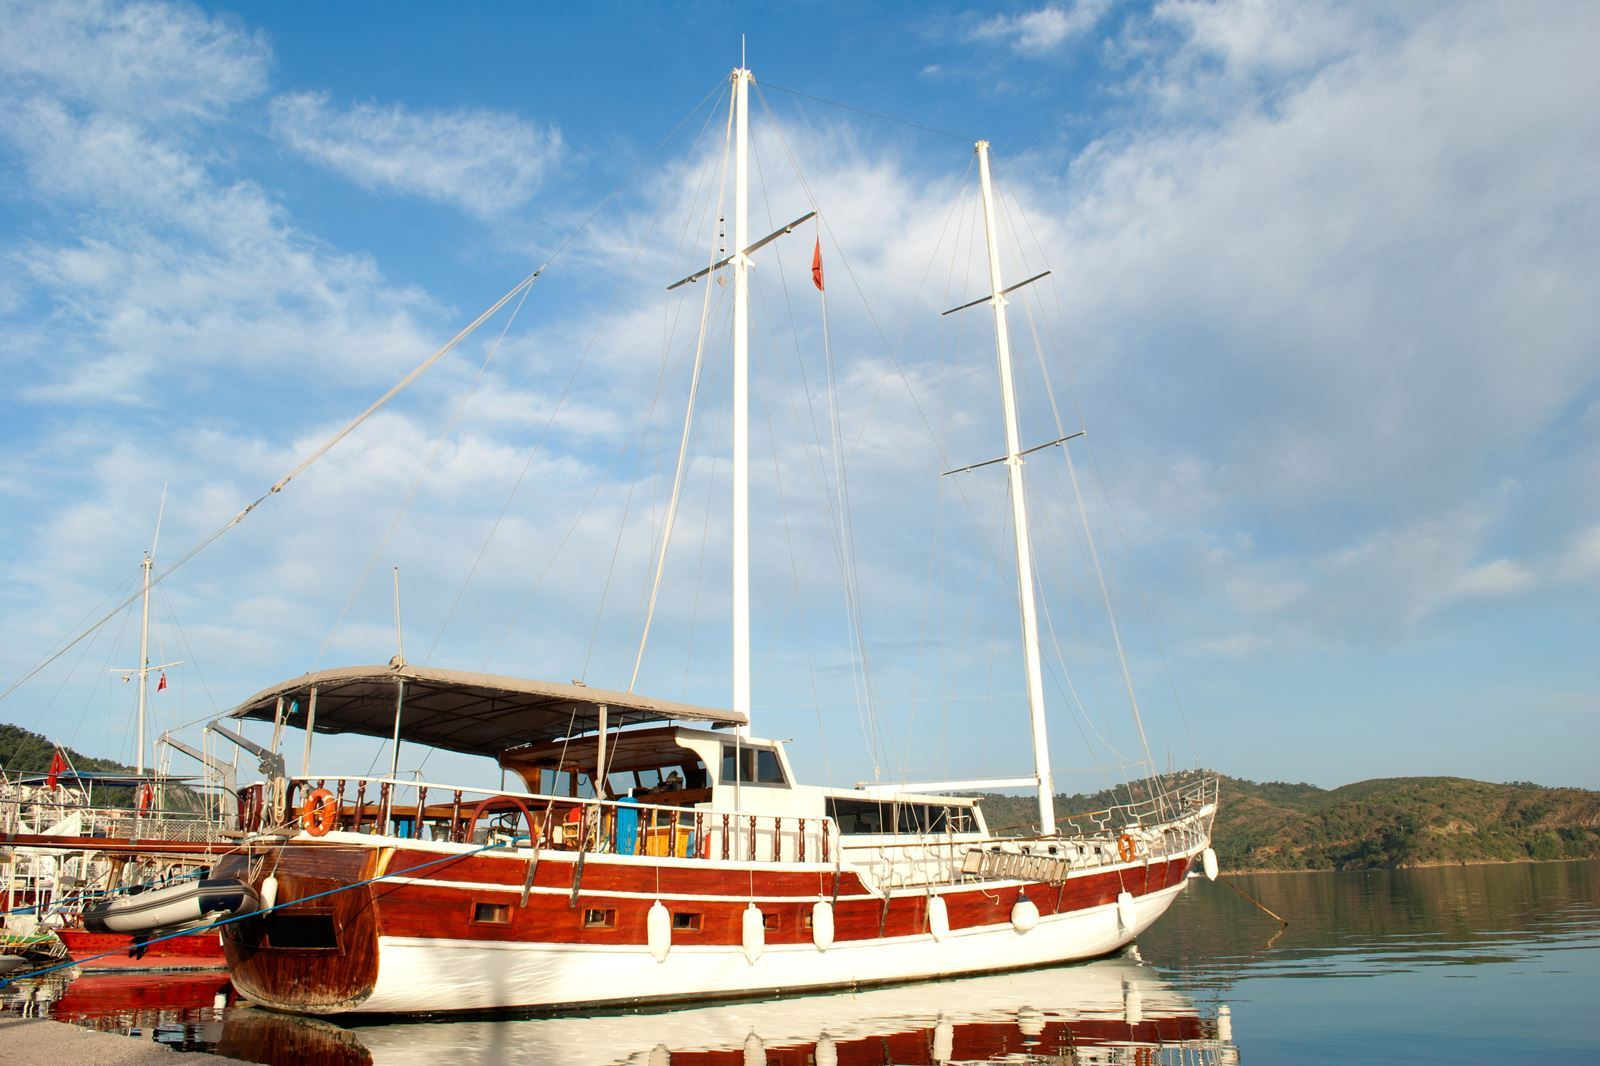 Blue Cruise&Ideal Prime Beach corendon